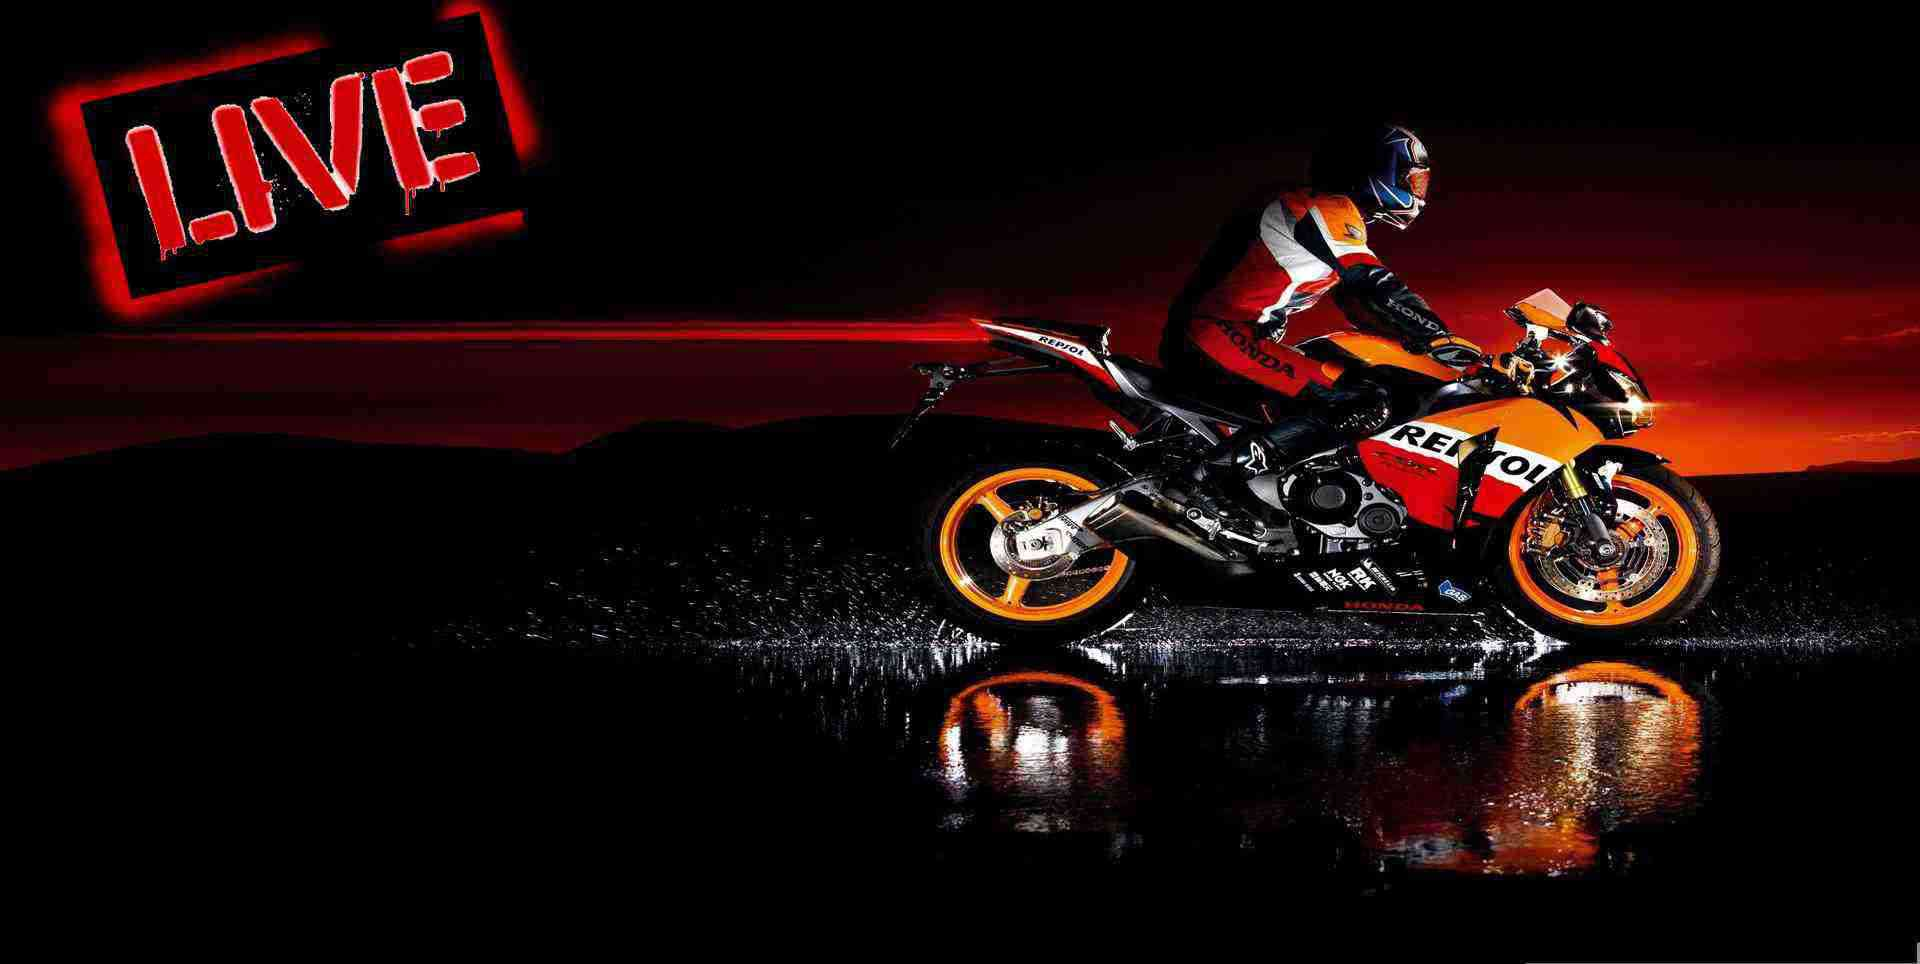 2016-octo-british-grand-prix-motogp-live